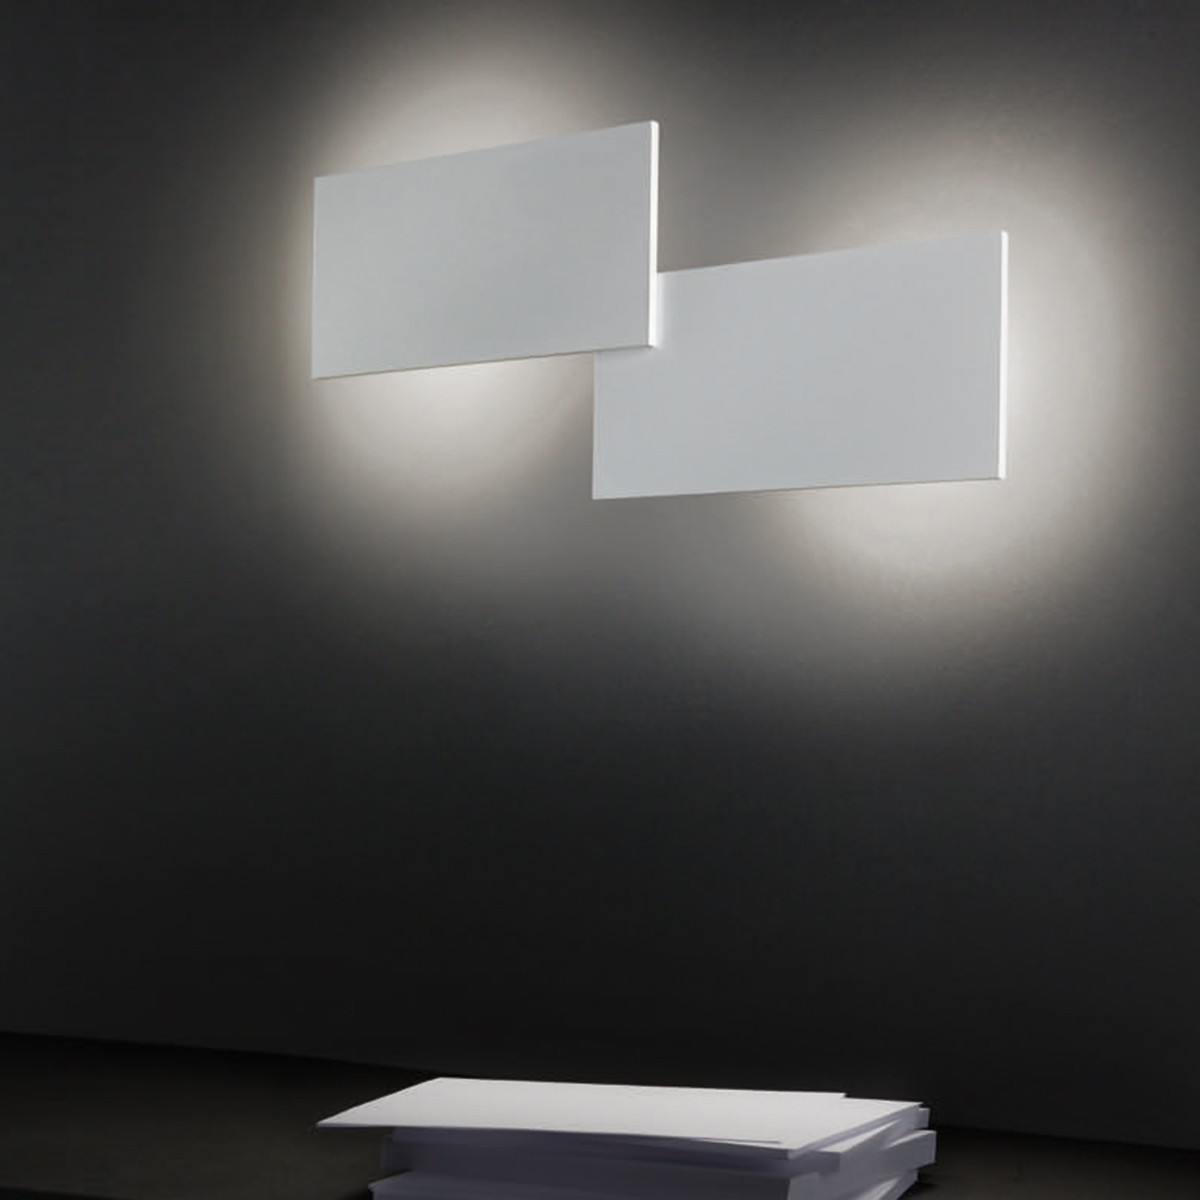 Studio Italia Design Puzzle Double Rectangle Wand- / Deckenleuchte, 3000 K, weiß matt